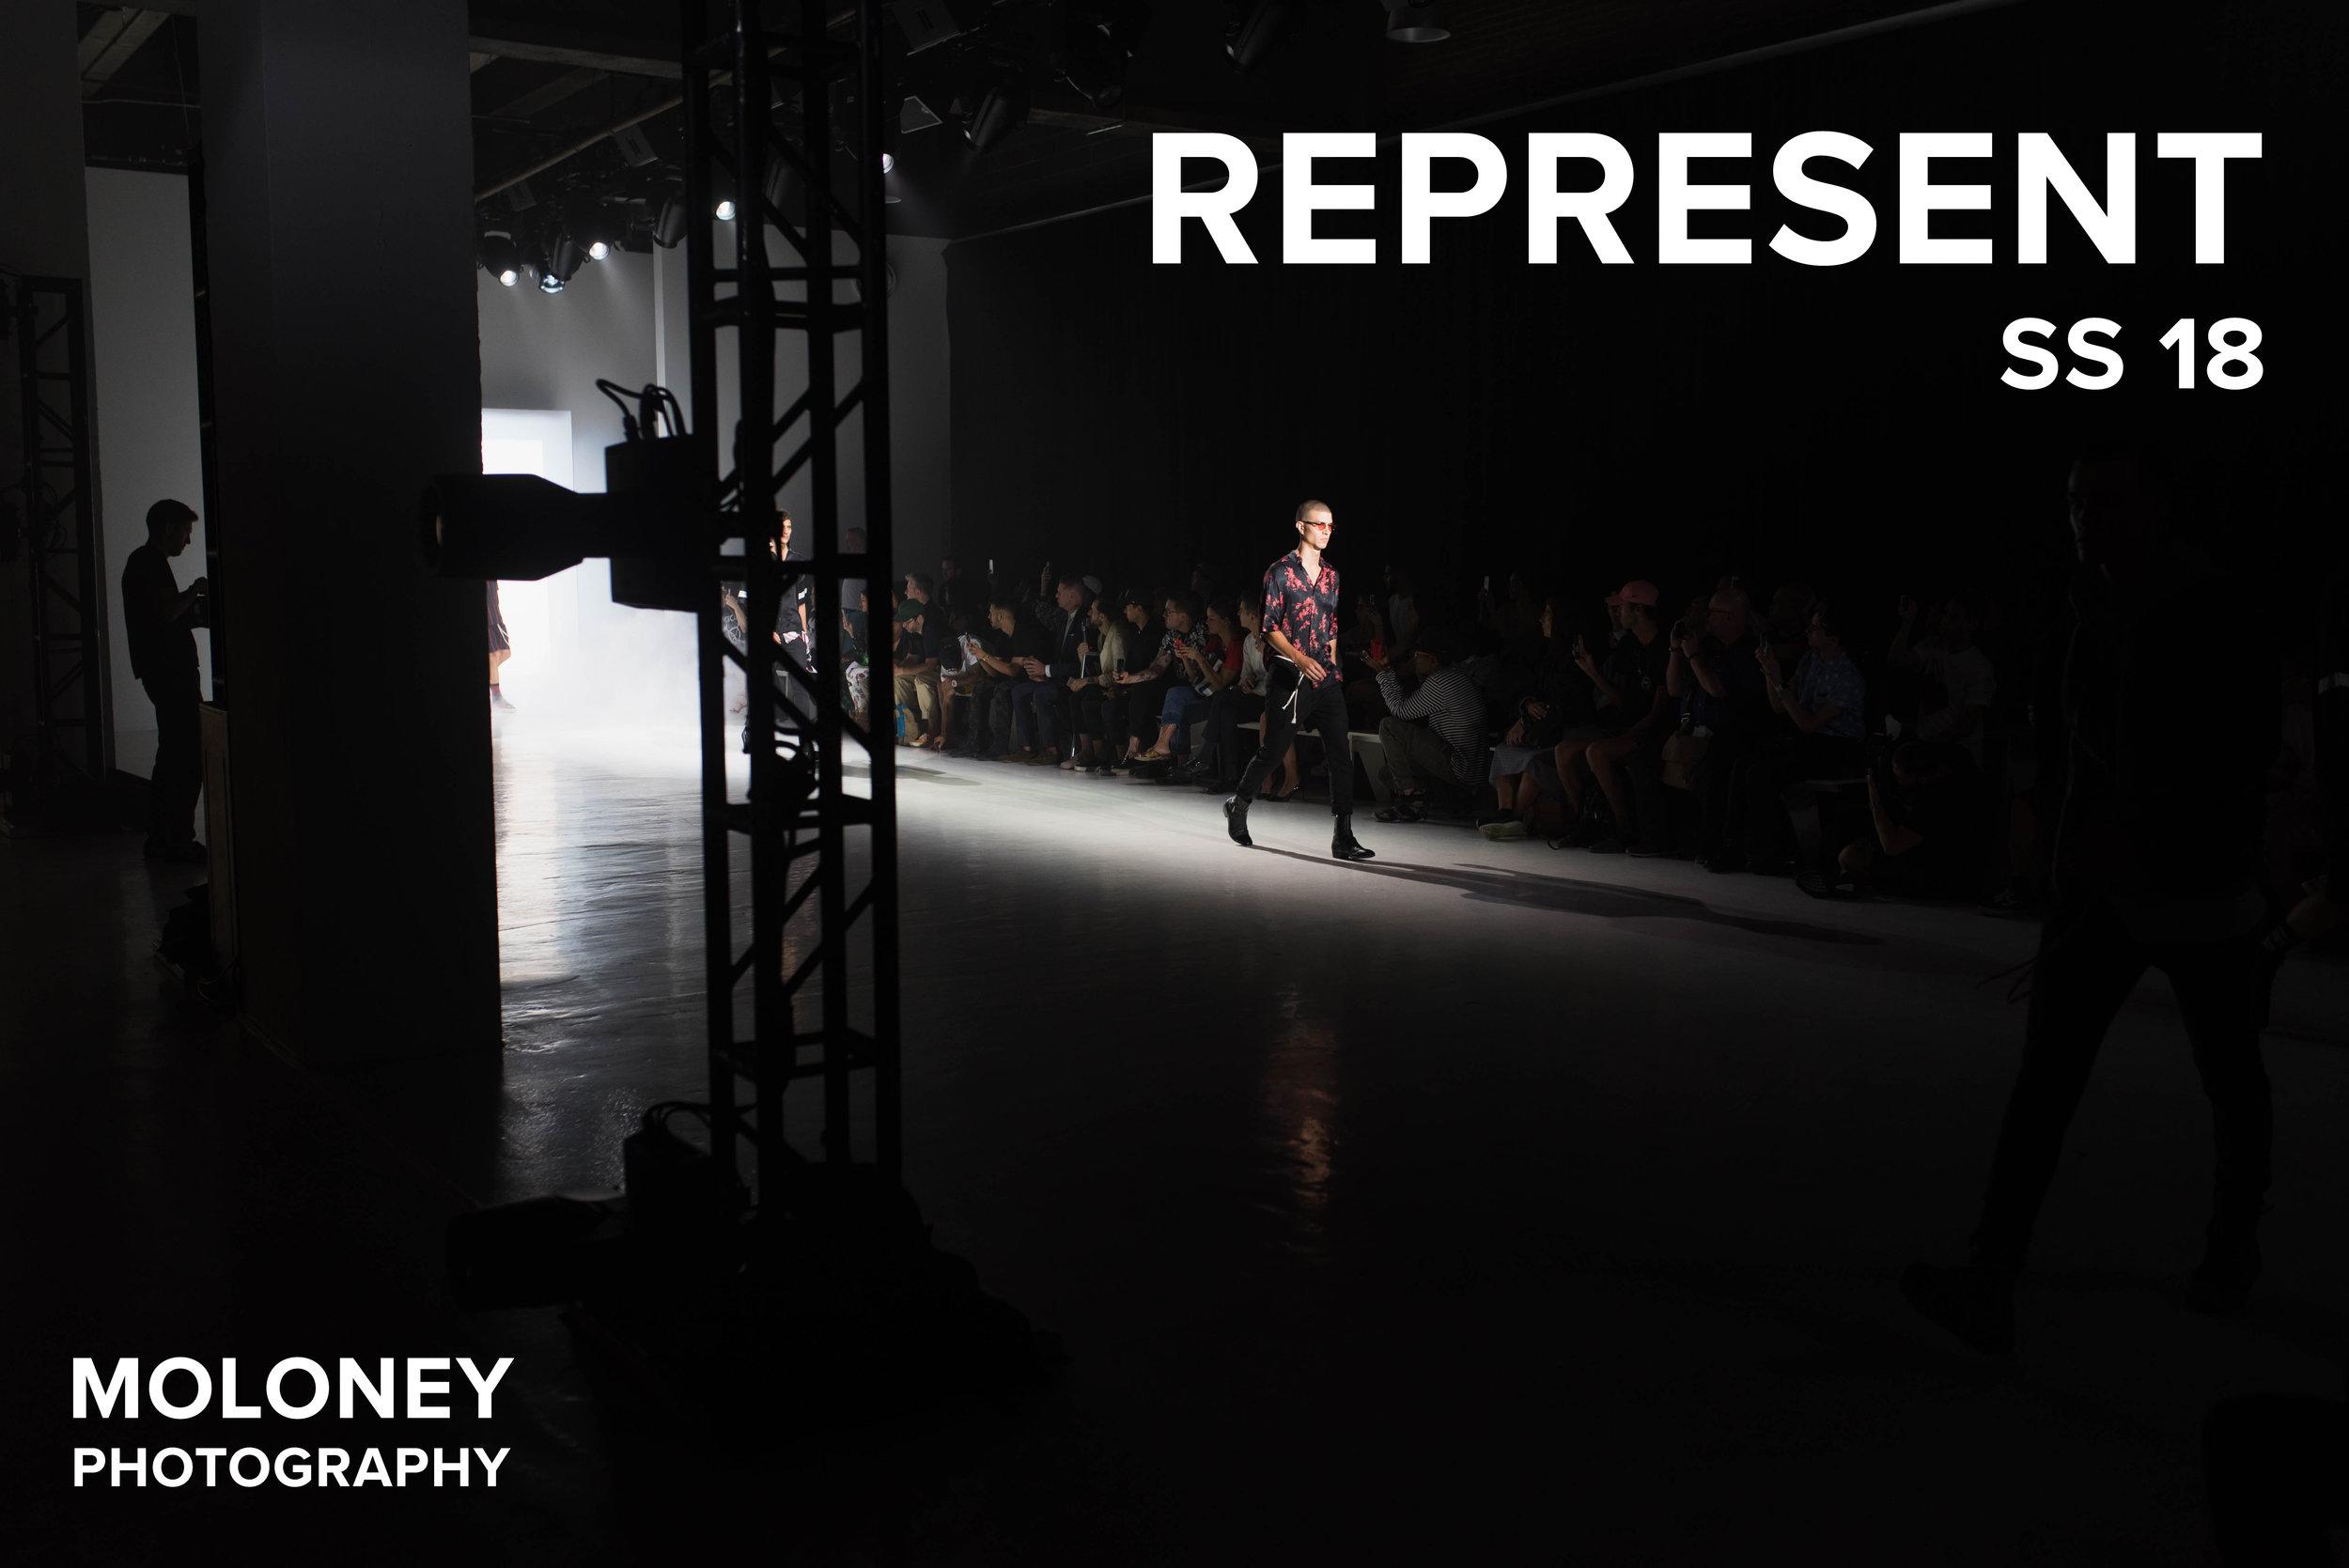 Represent SS 18 - Moloney Photography.jpg